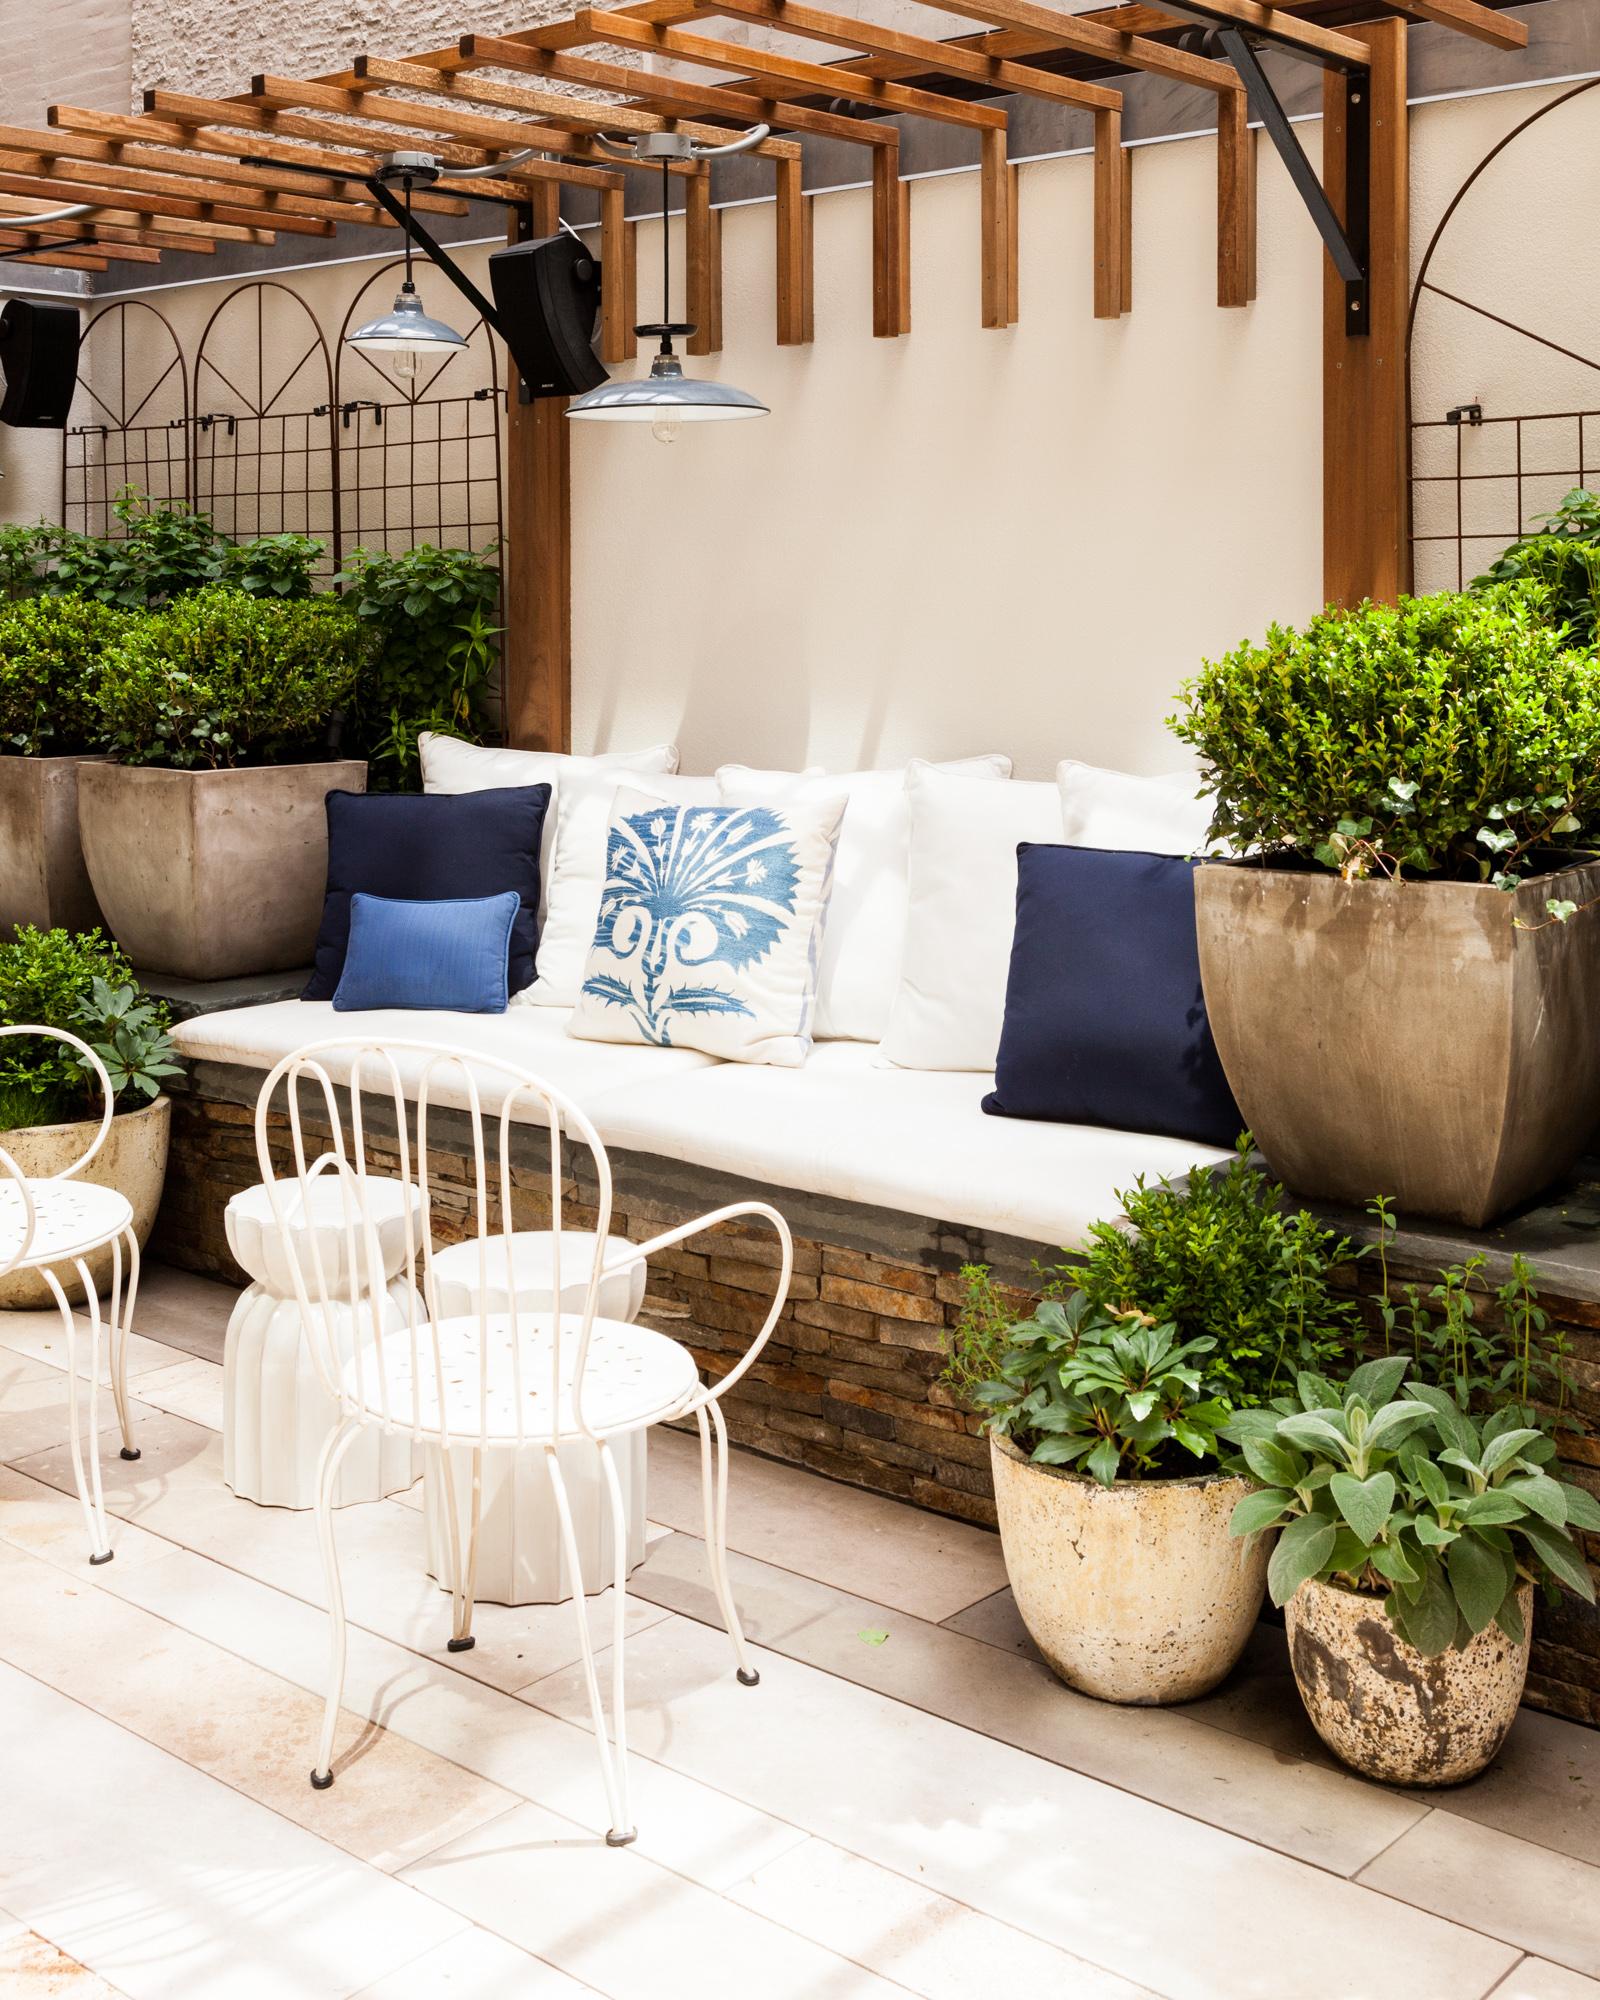 New York City townhouse gardenby Sara Gilbane Interiors